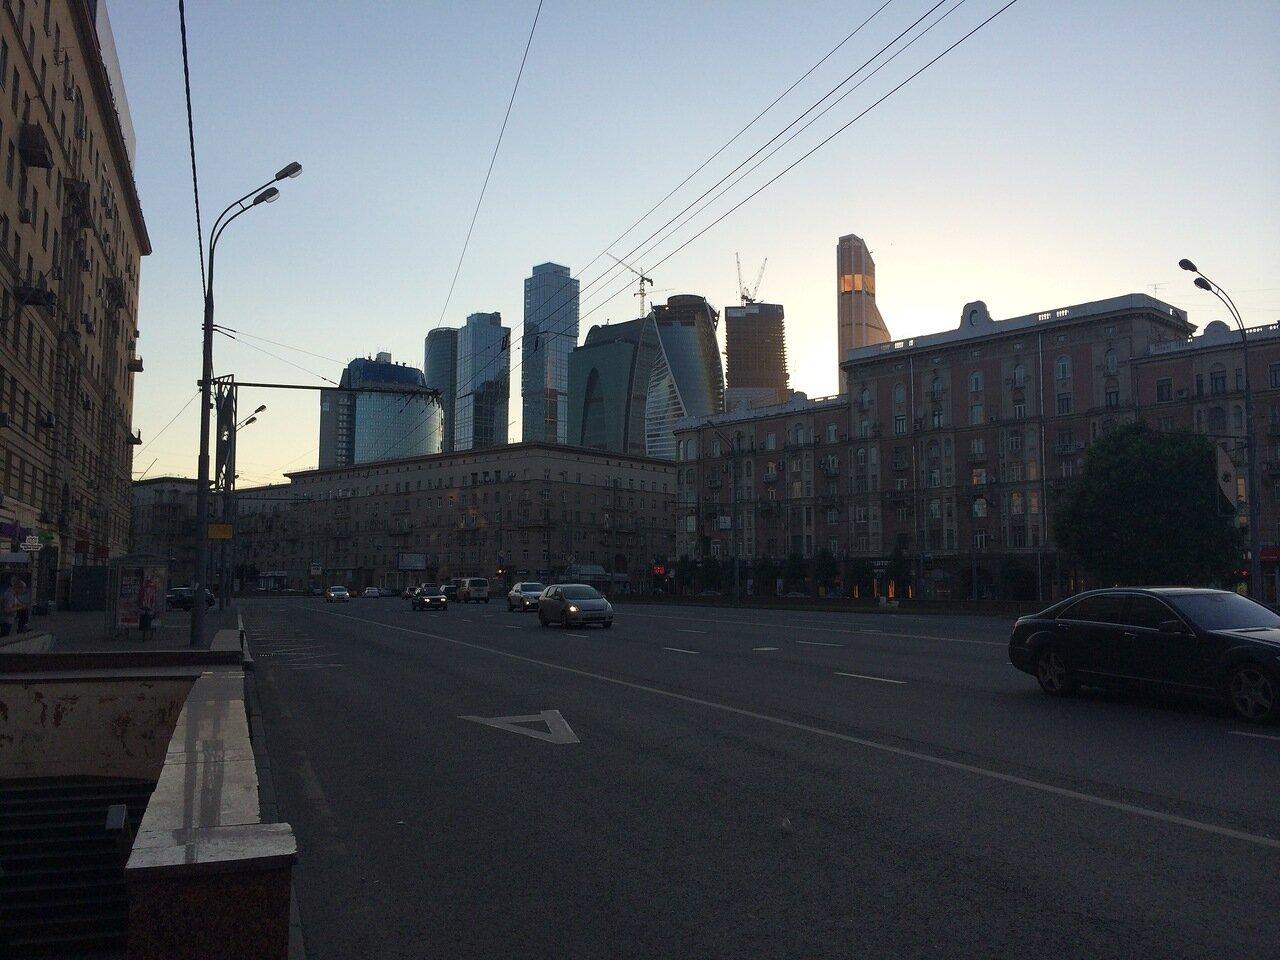 http://img-fotki.yandex.ru/get/9651/82260854.303/0_bf27f_98394396_XXXL.jpg